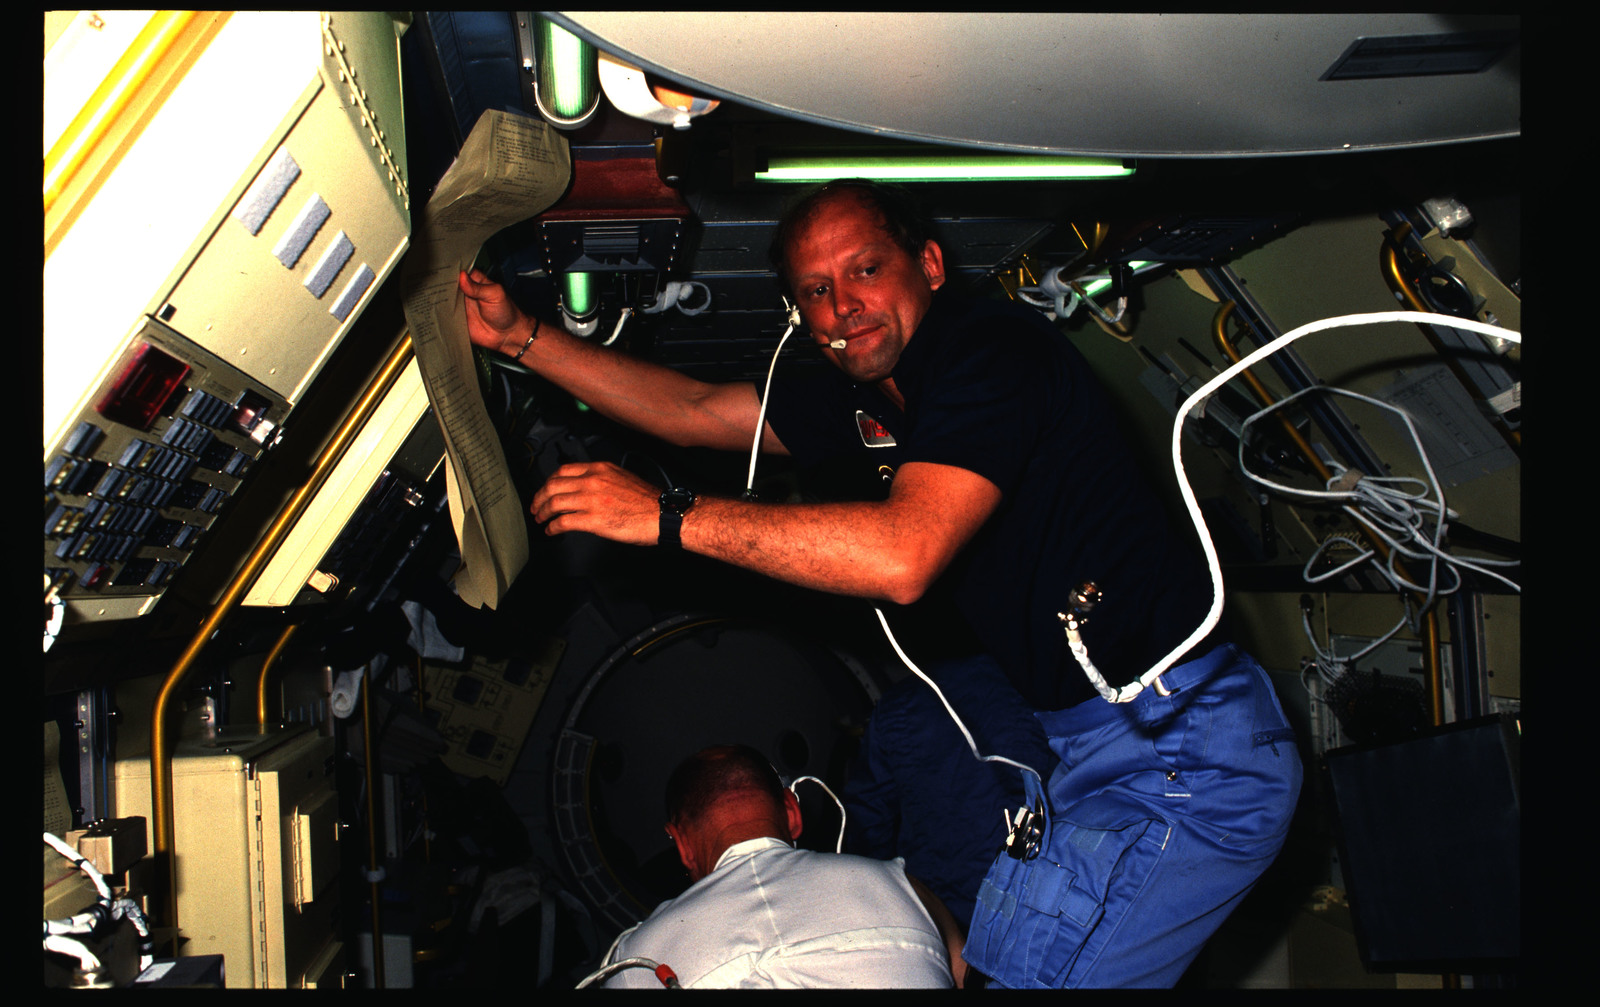 51B-04-032 - STS-51B - 51B crew activities